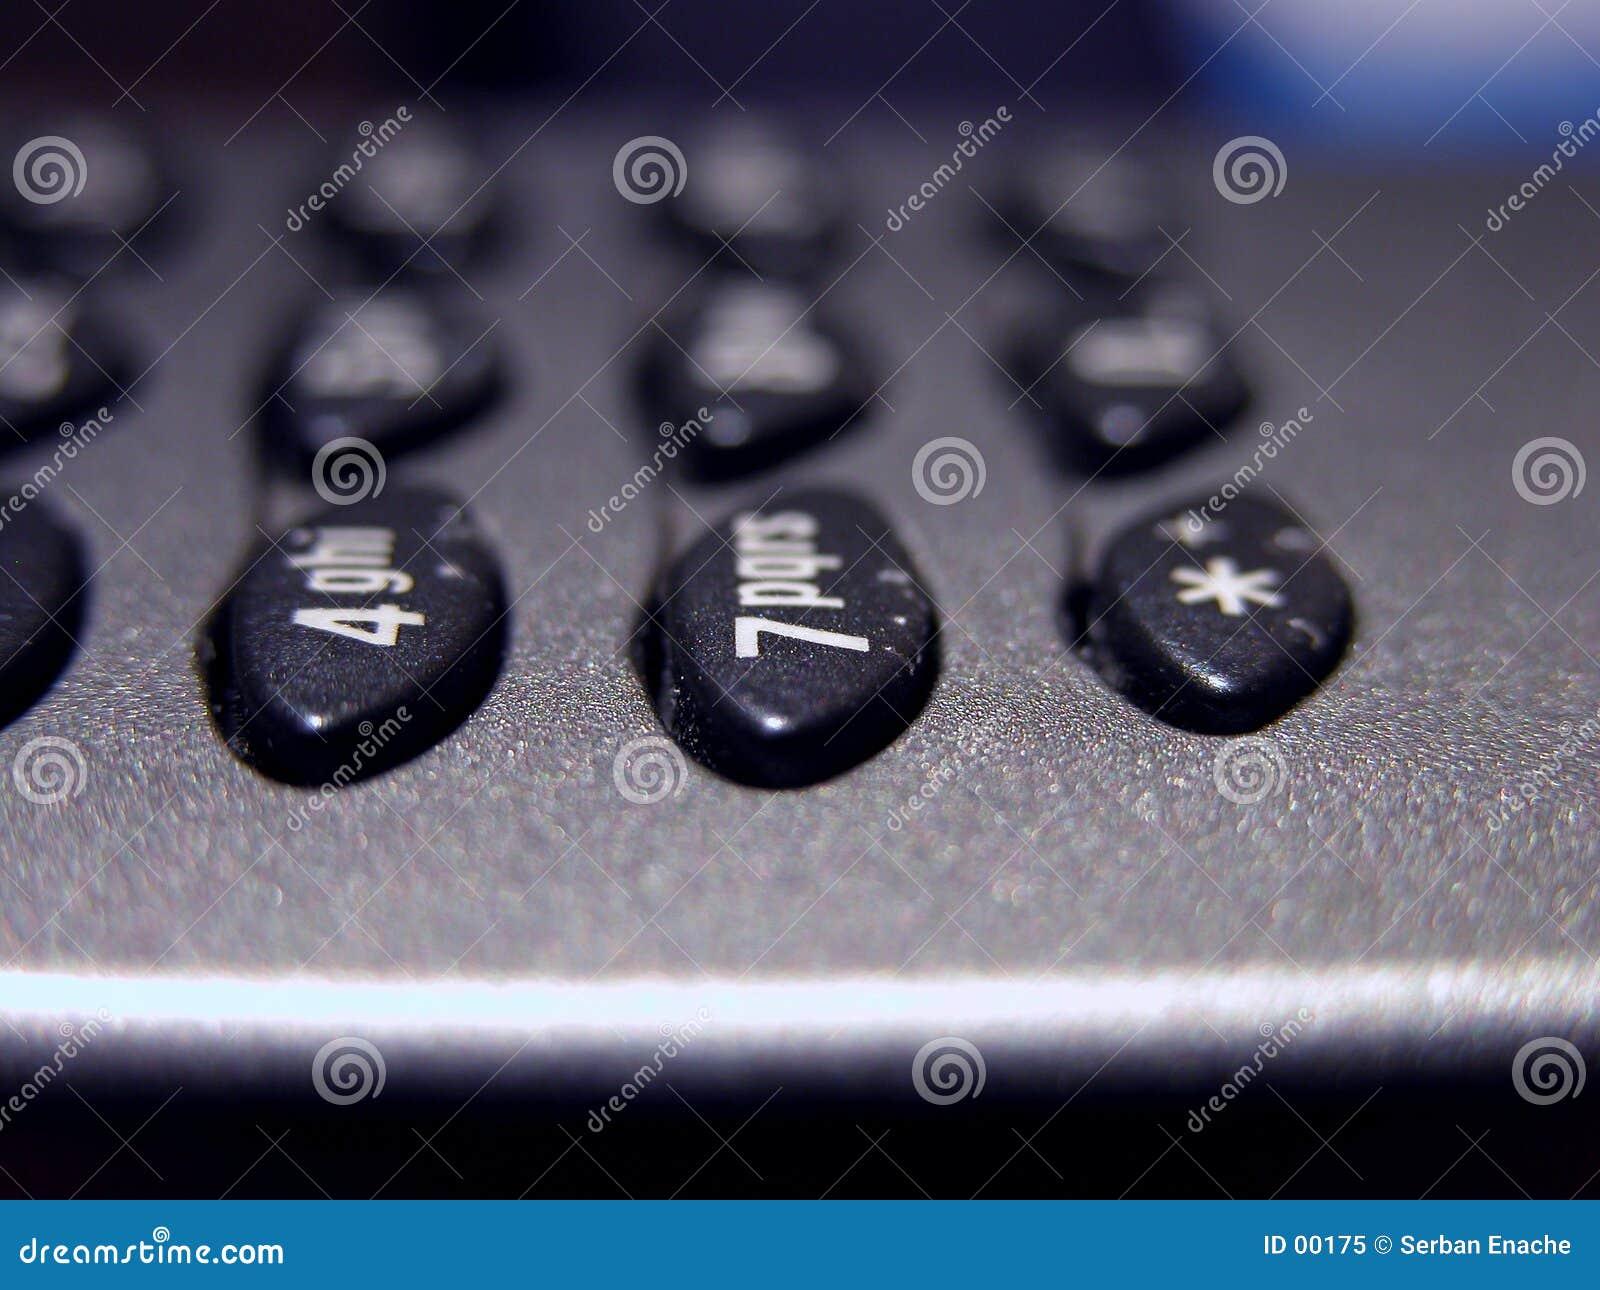 Mobile phone - detail